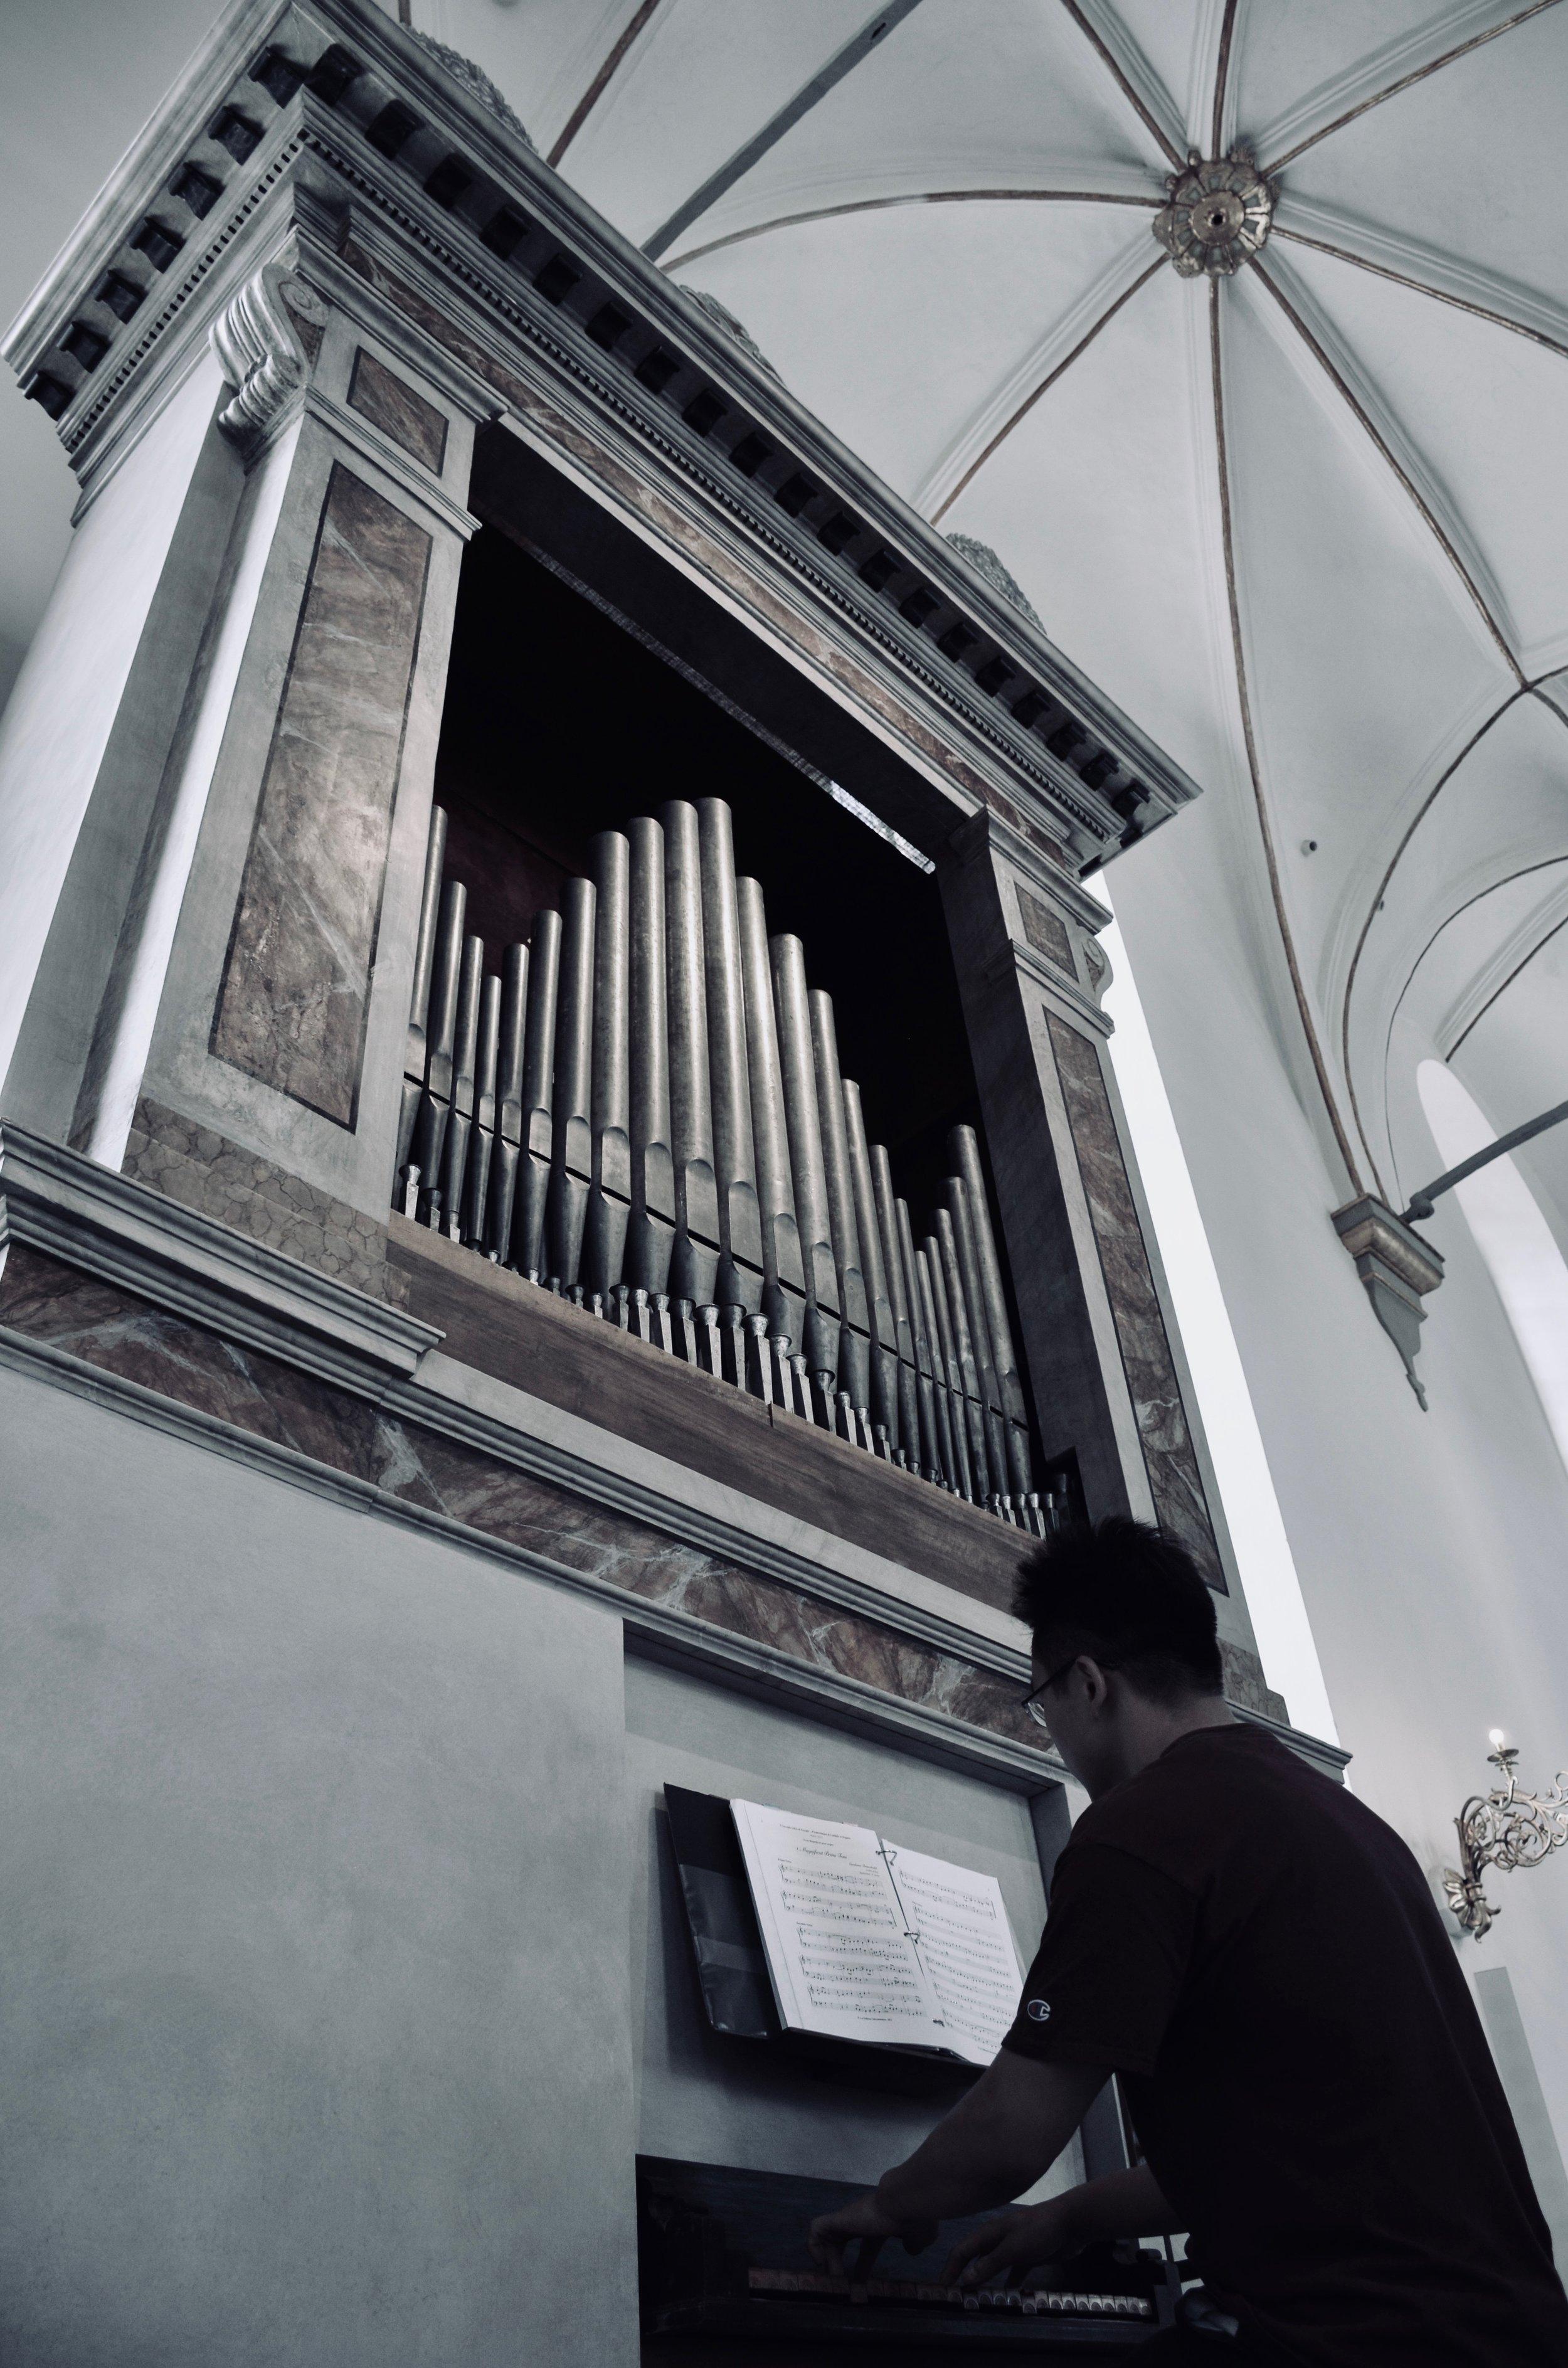 Adrian Cho plays the Italian baroque organ in Trinitatis Kirke, Copenhagen.